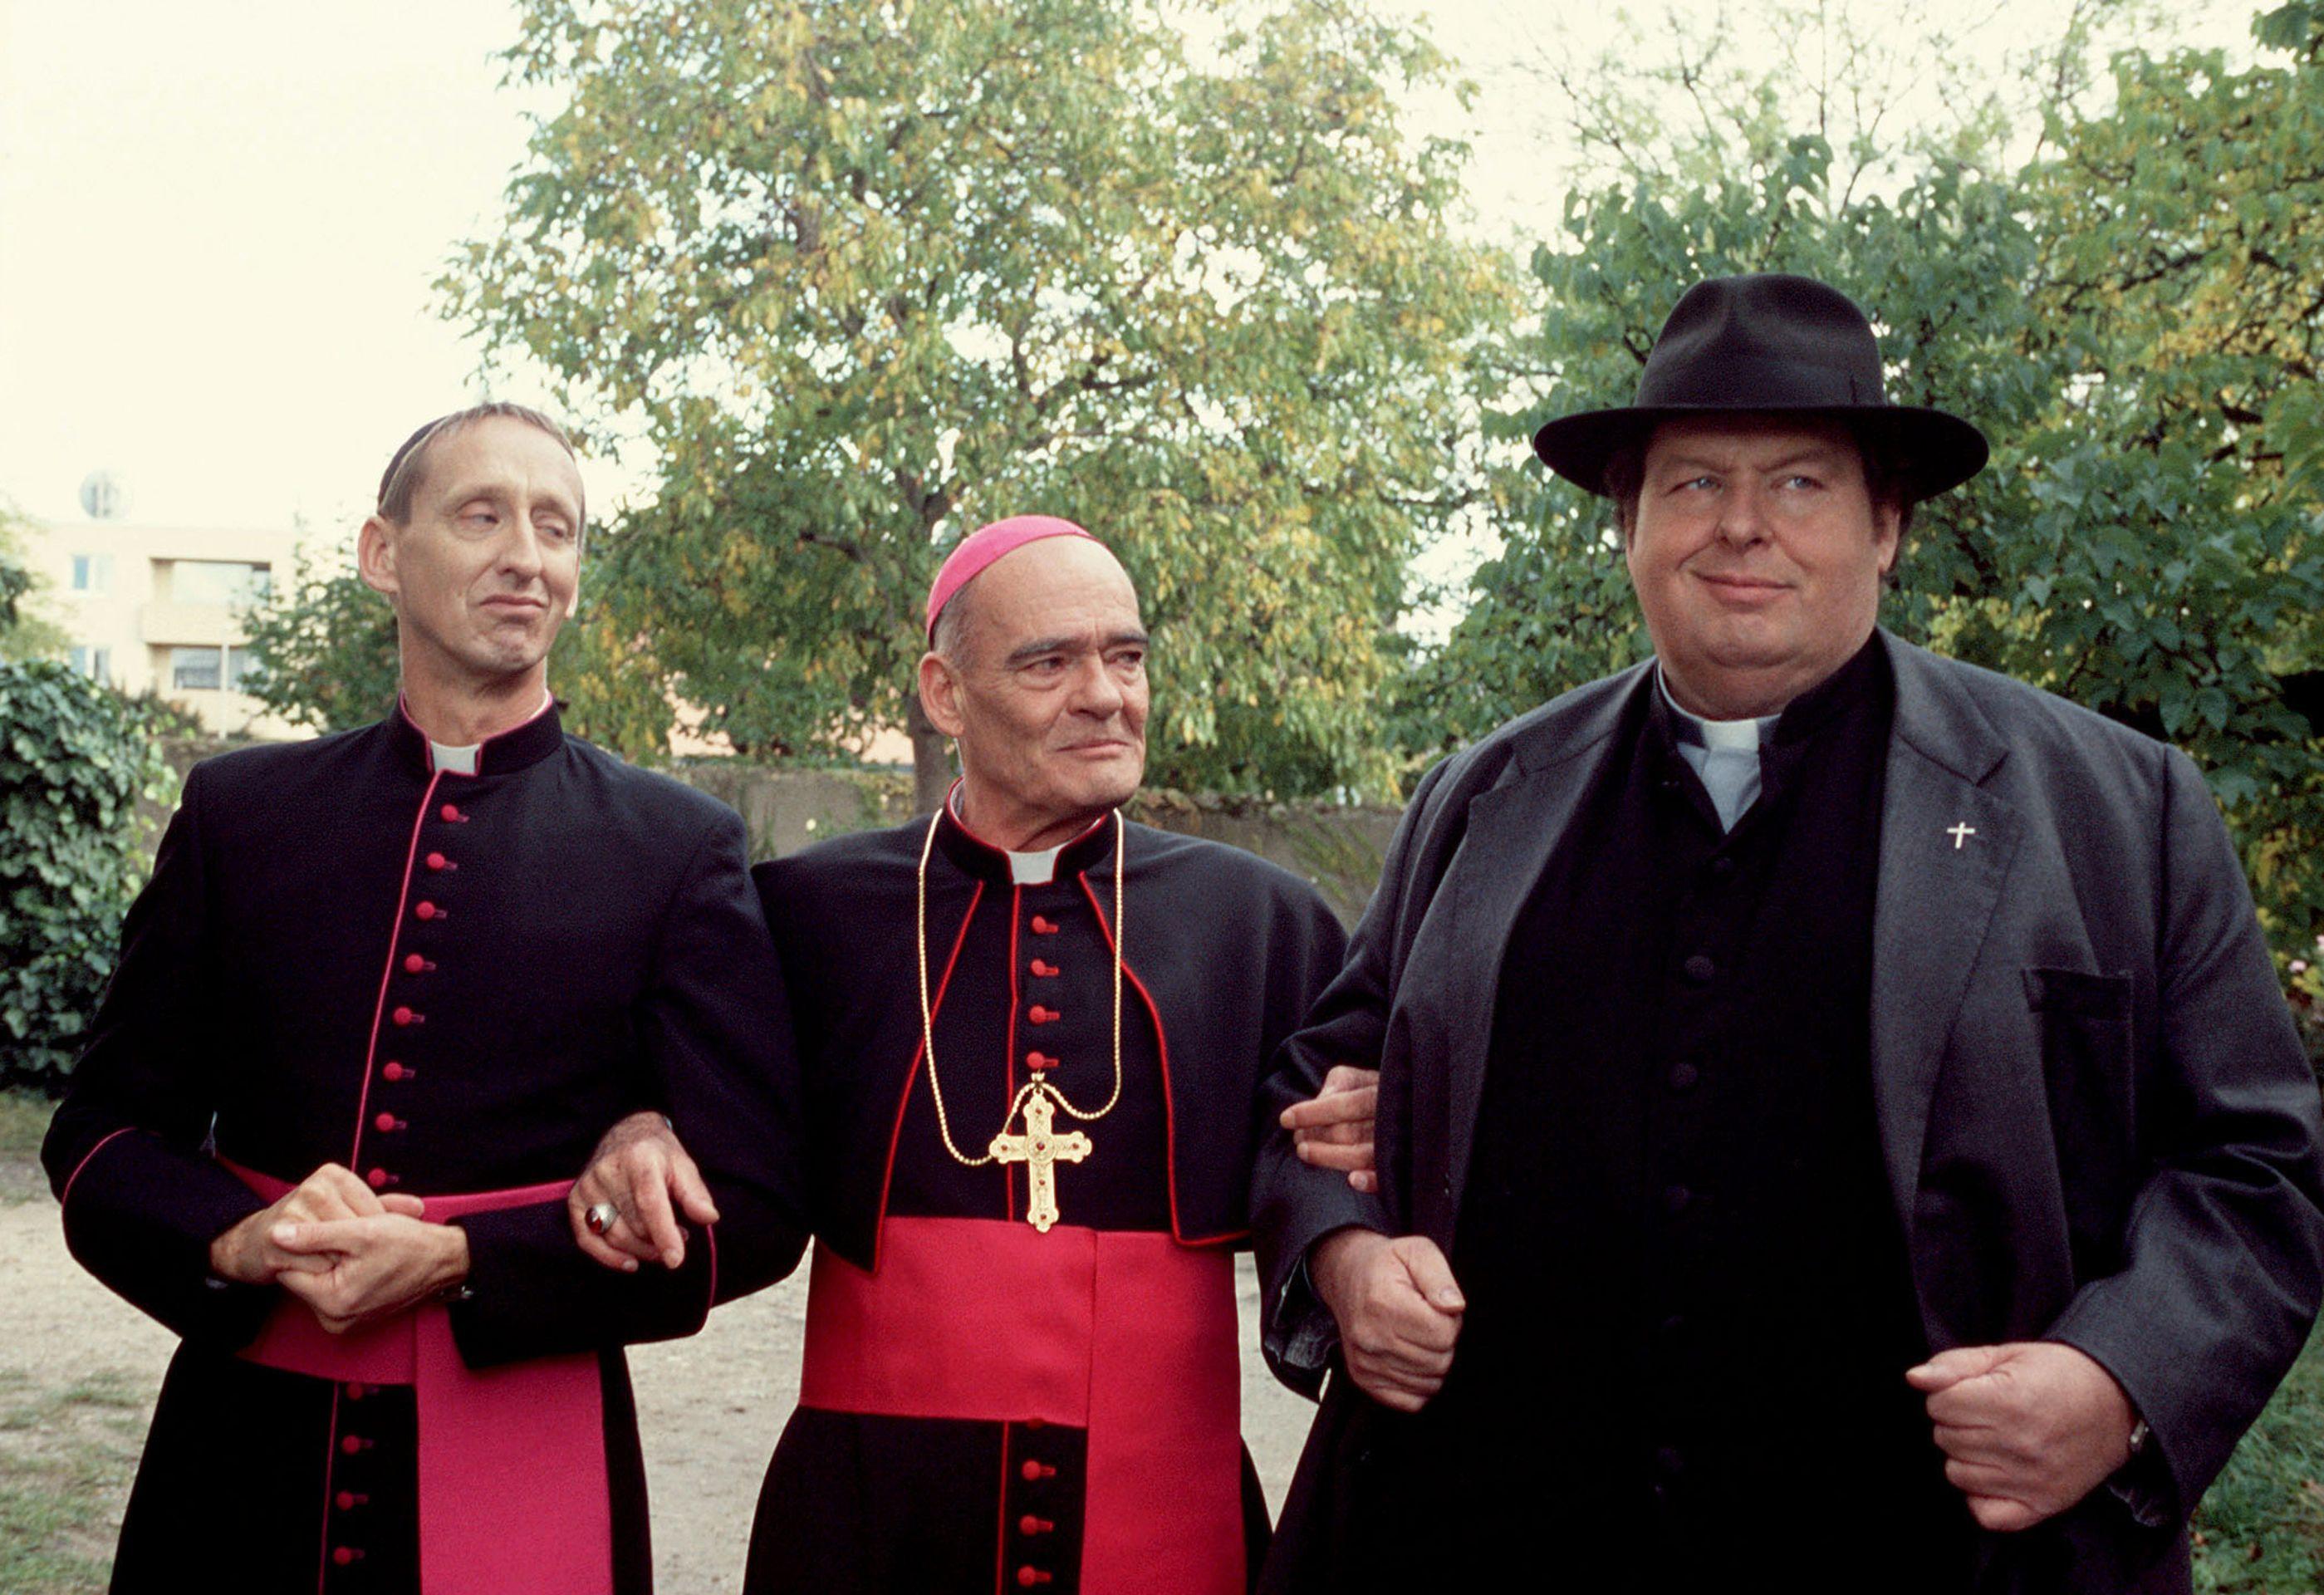 Bischof Hemmelrath